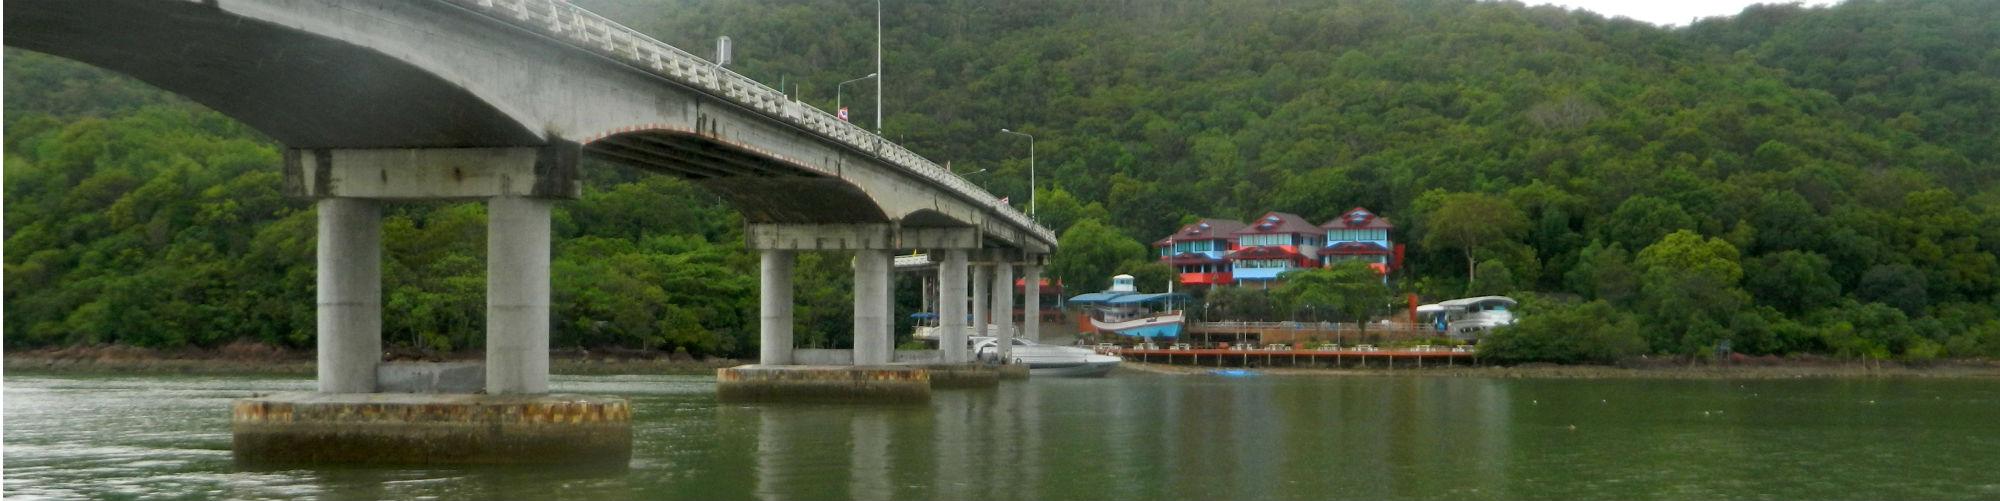 Laem Sing Bridge, Chanthaburi Province